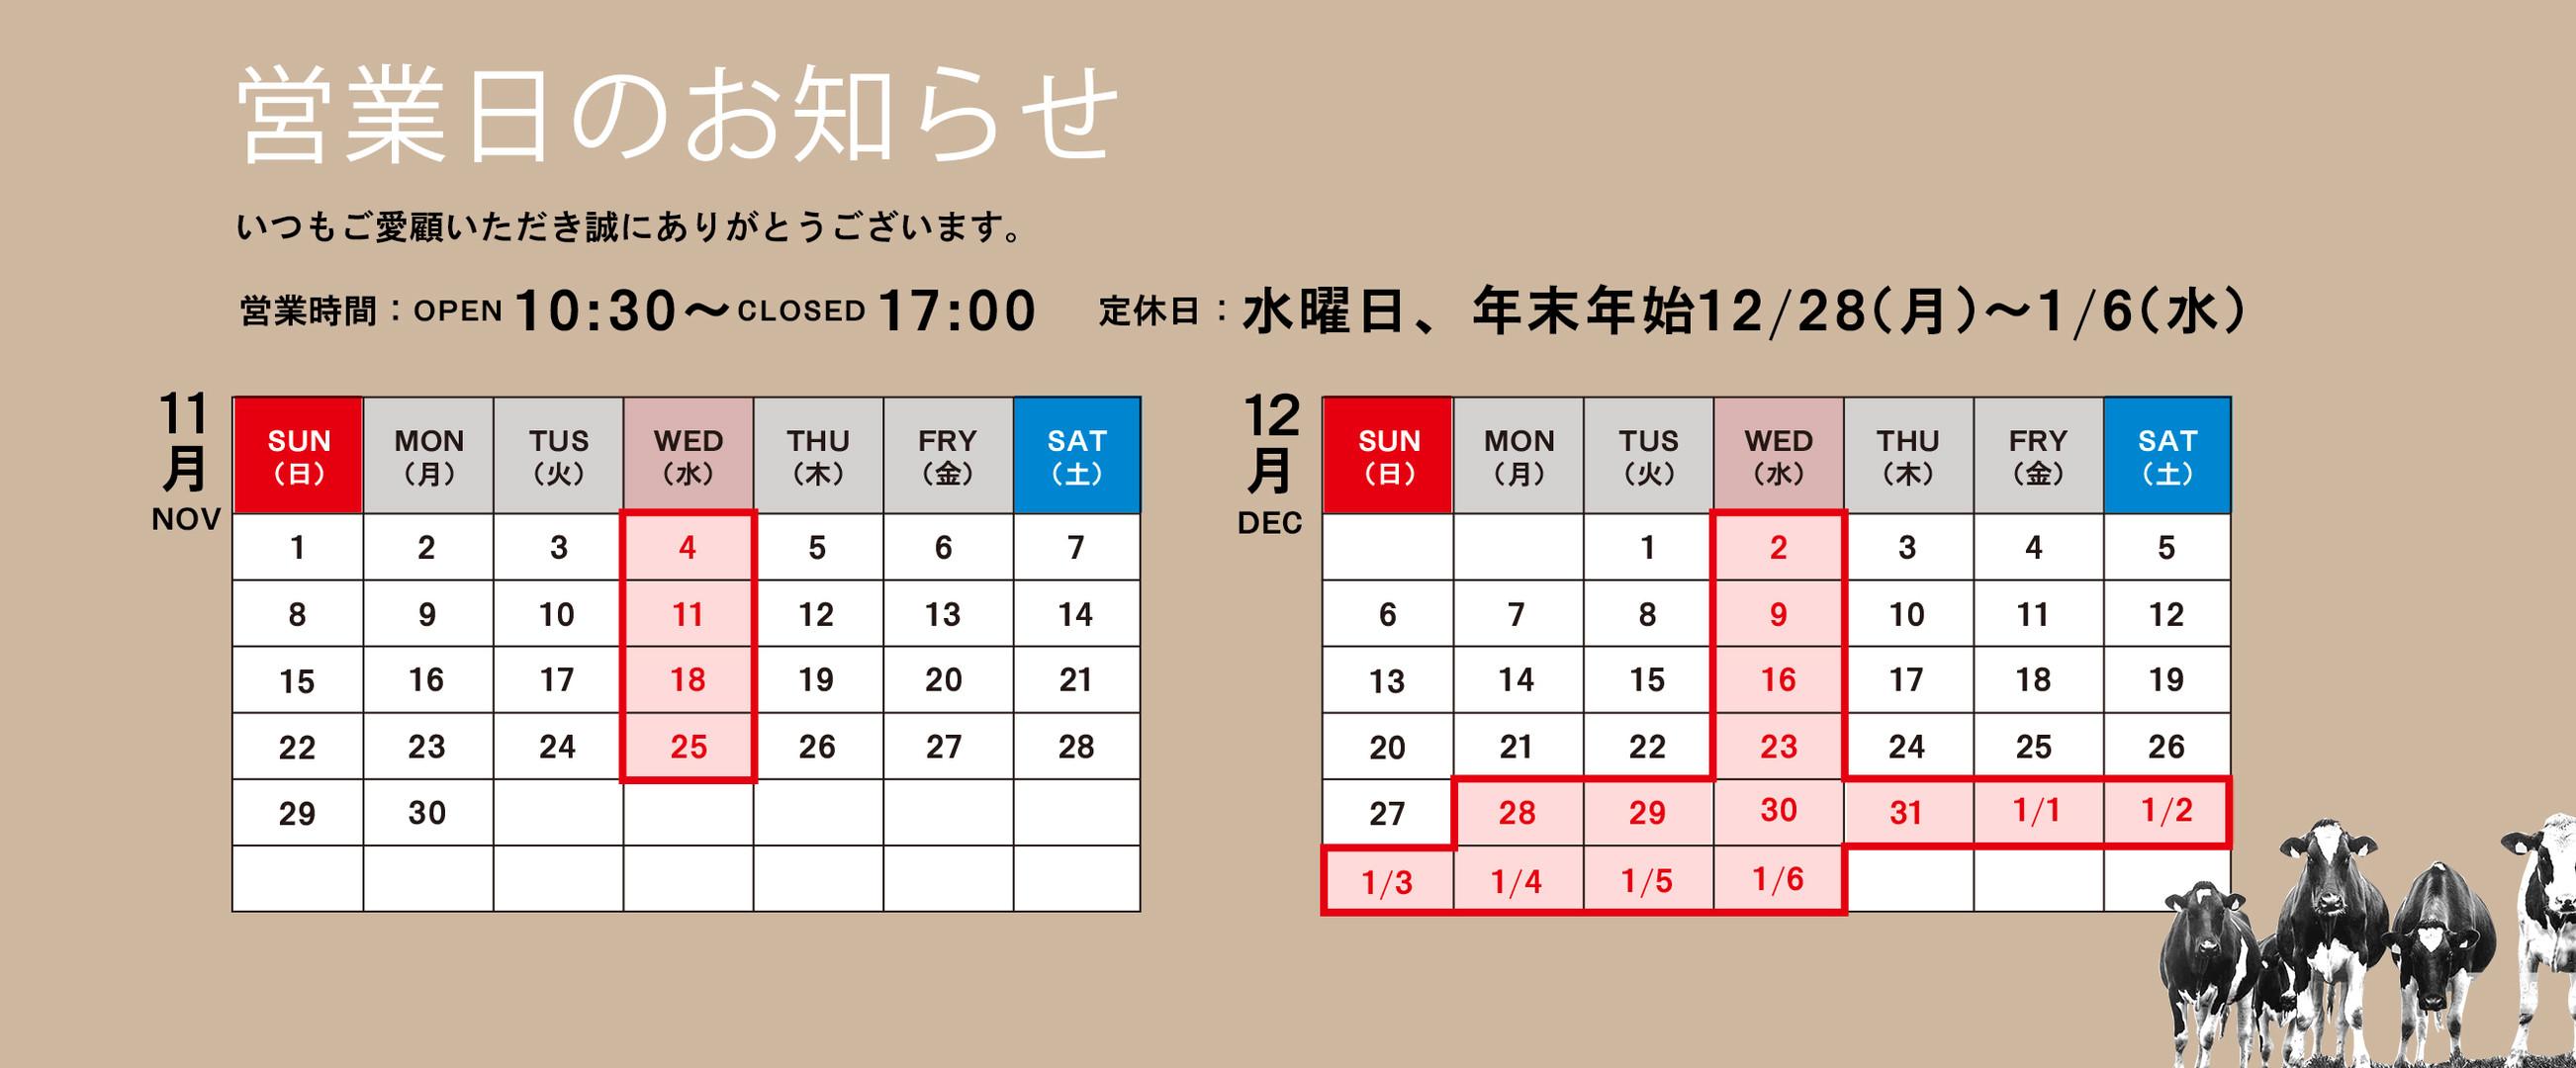 news13.jpg